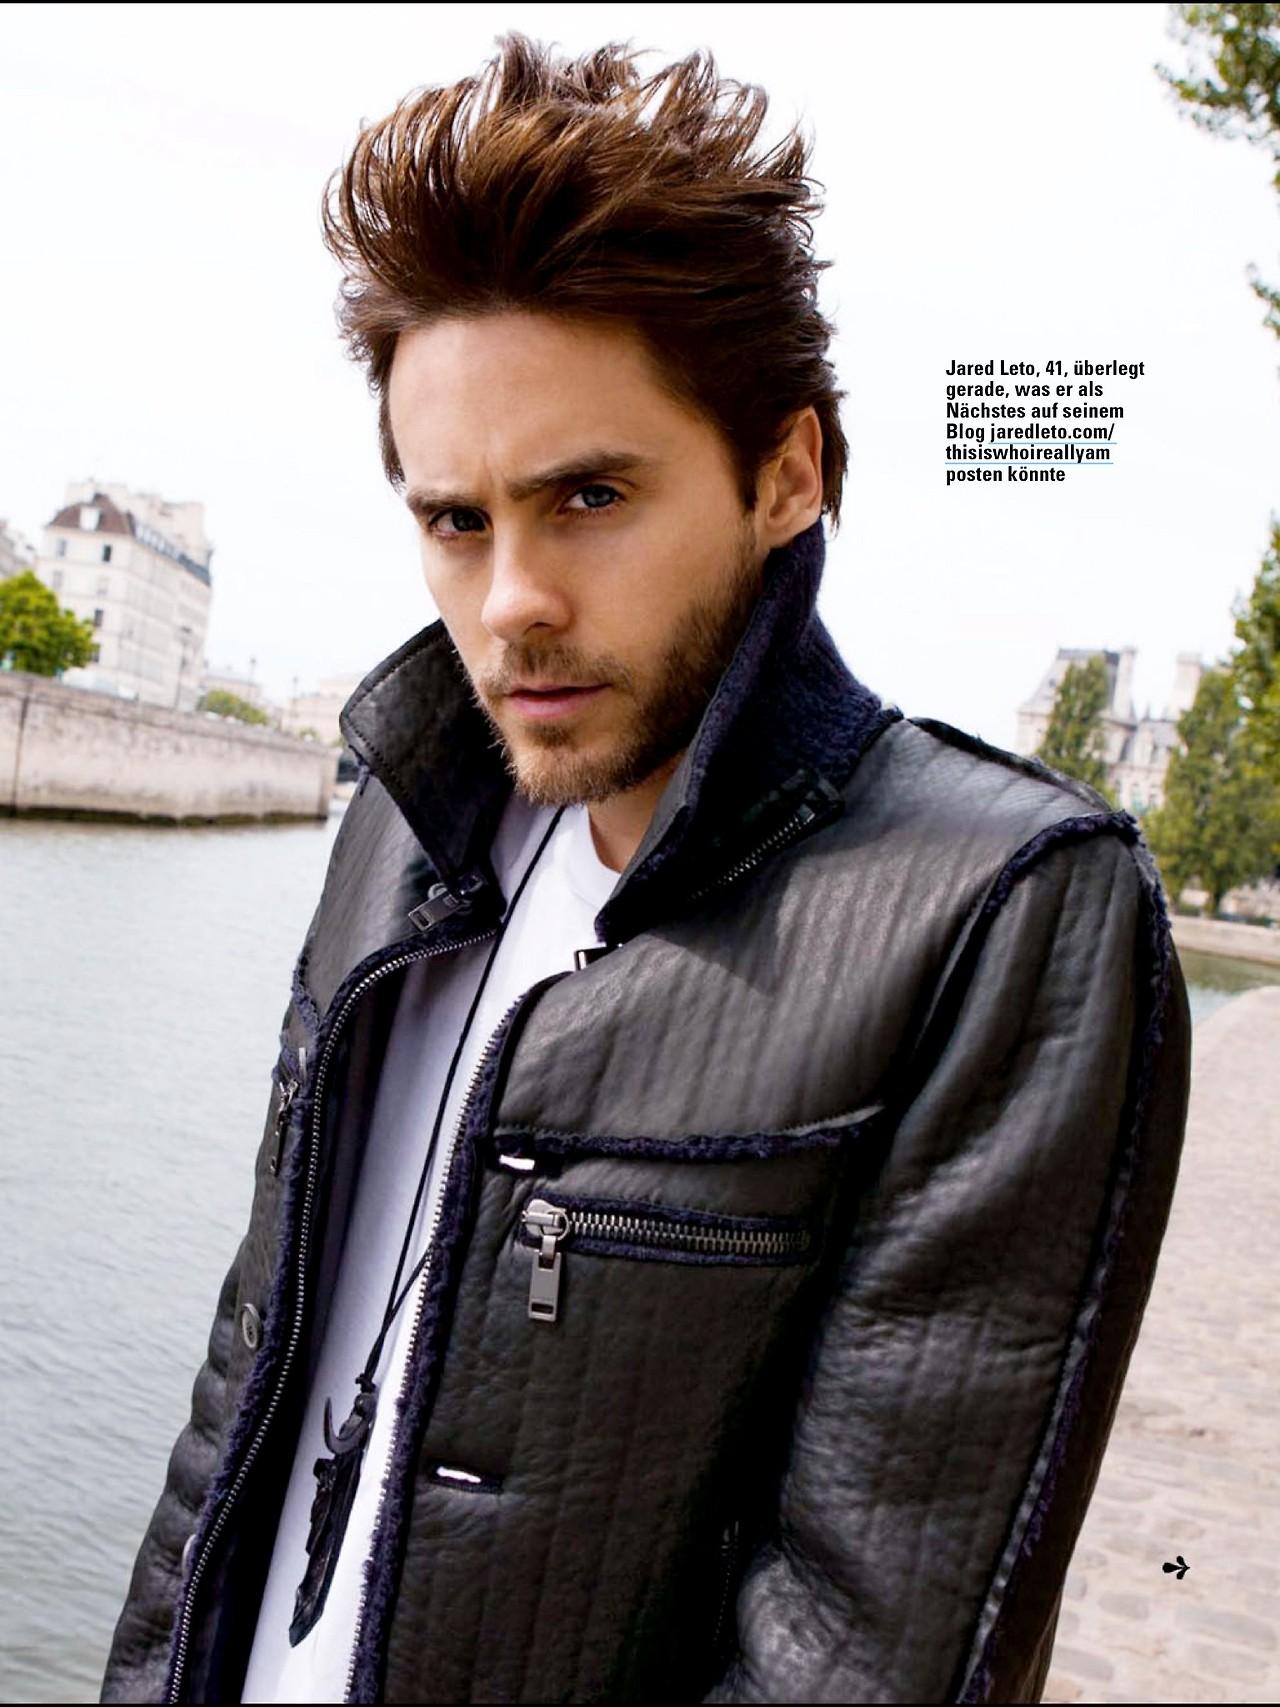 Jared Leto For Nylon Guys: Jared Leto At Glamour Magazine -Germany June 2013